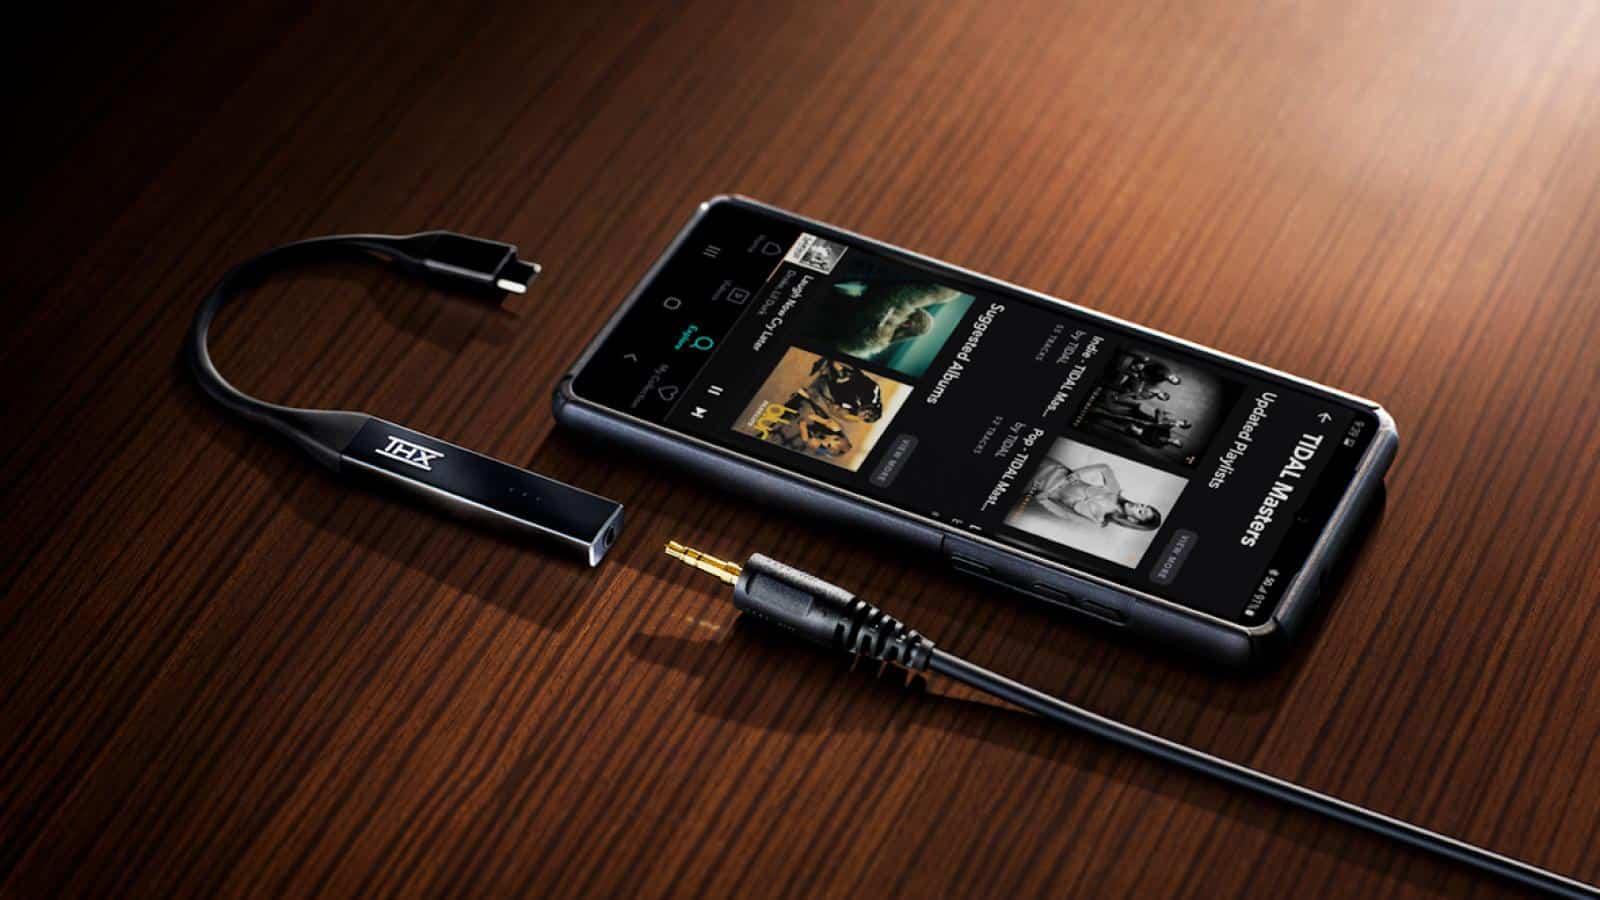 thx onyx dac amp on table next to smartphone and headphone plug